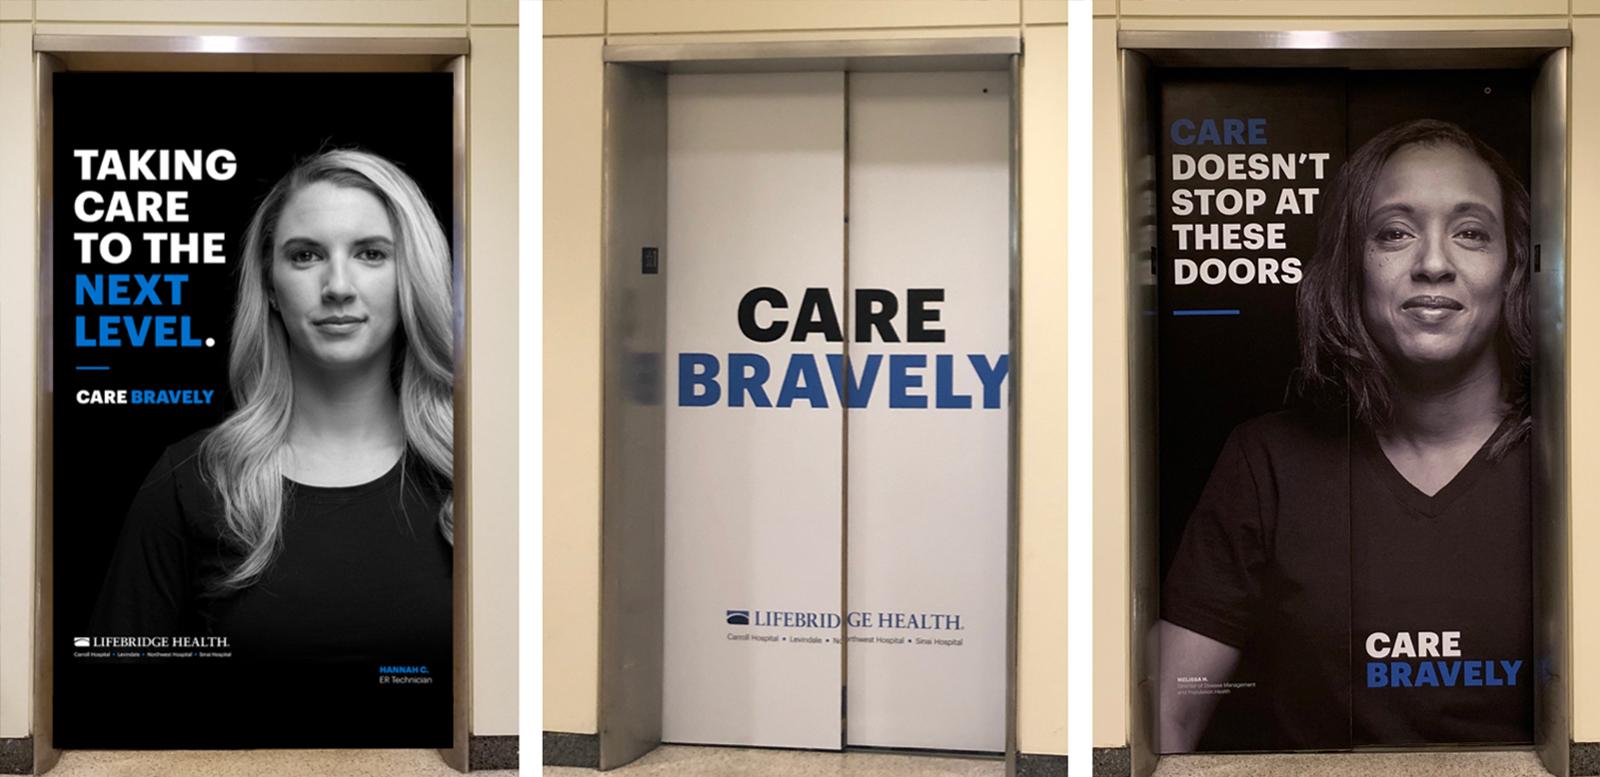 Image: https://a.storyblok.com/f/114448/1600x777/28826977dc/lifebridge-elevator-1600x777.jpg